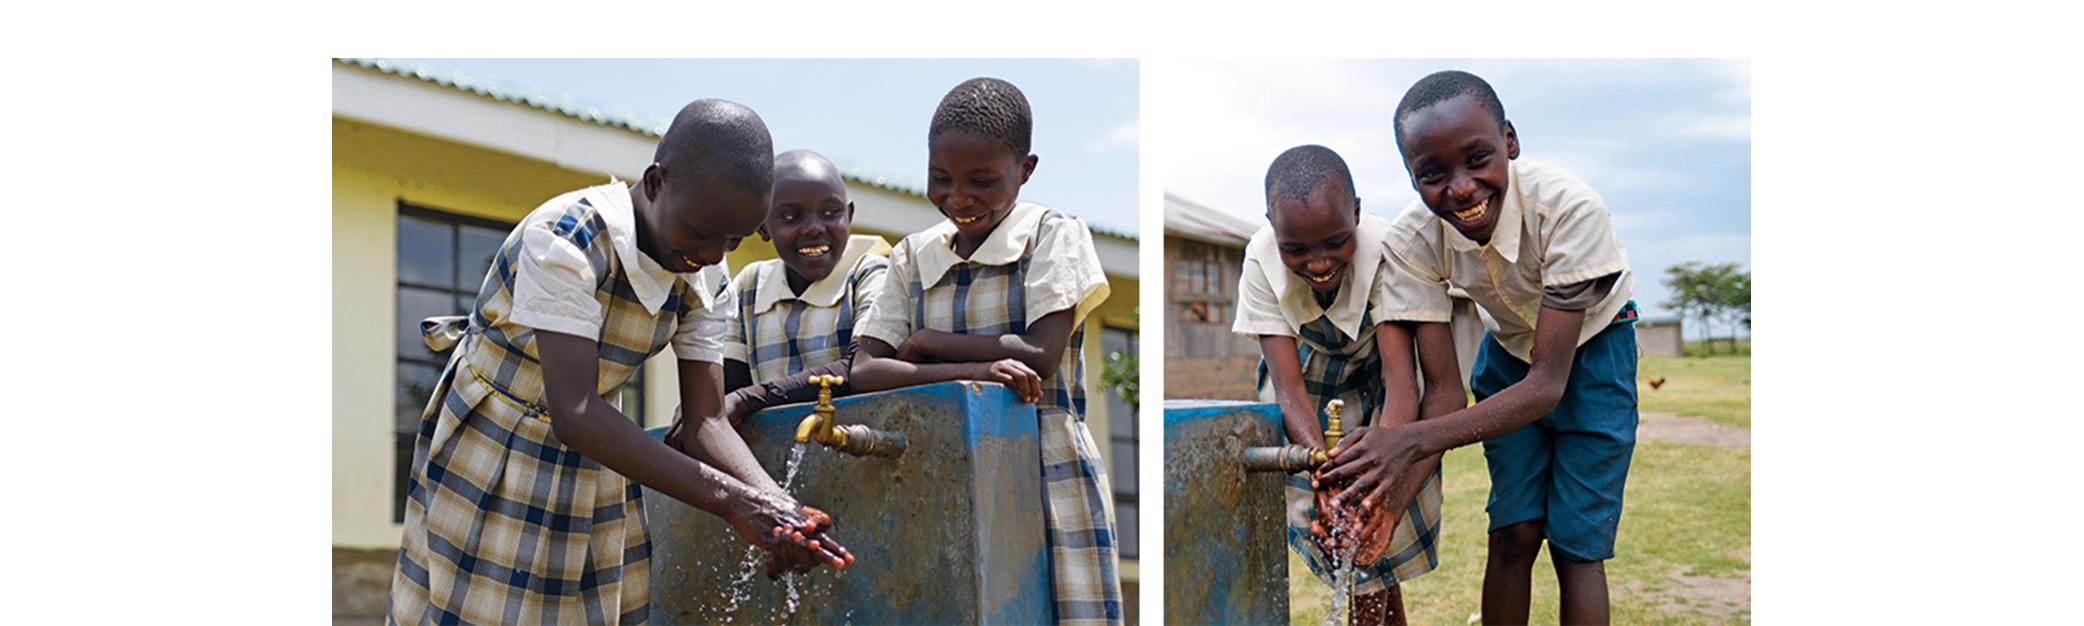 Water Management Committee in rural Kenya is the ...